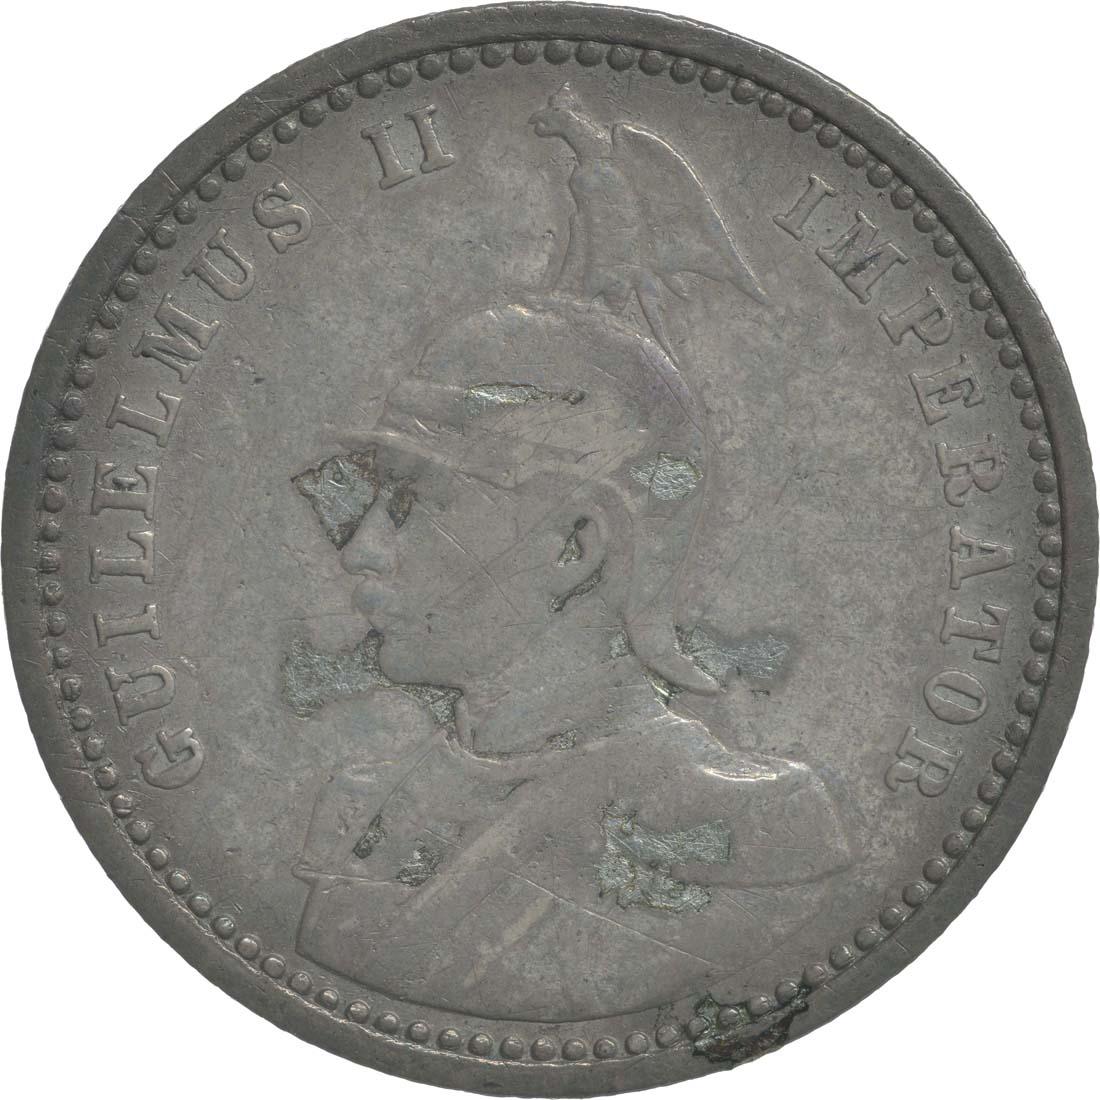 deutschland 0 25 rupie wilhelm ii in uniform punkt a vs patina 1904 a silber ss 35 euro. Black Bedroom Furniture Sets. Home Design Ideas